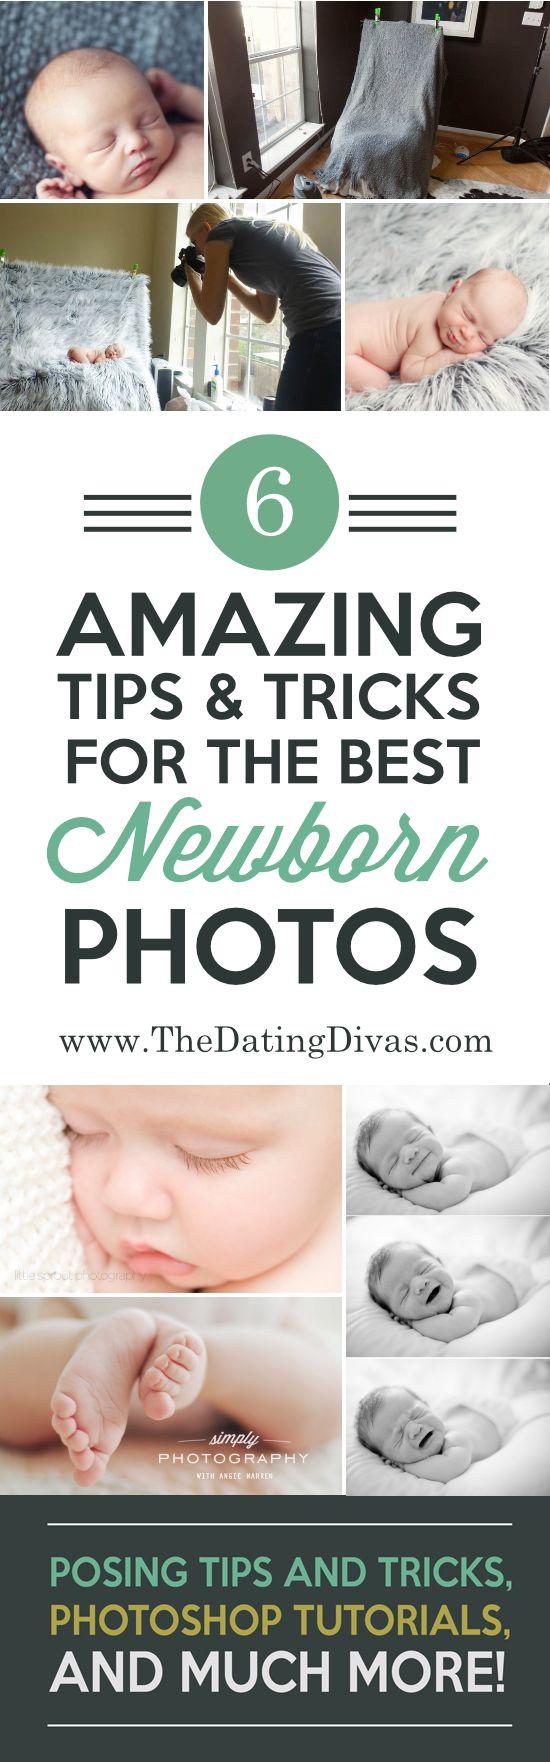 Newborn Photography Tips and Tricks